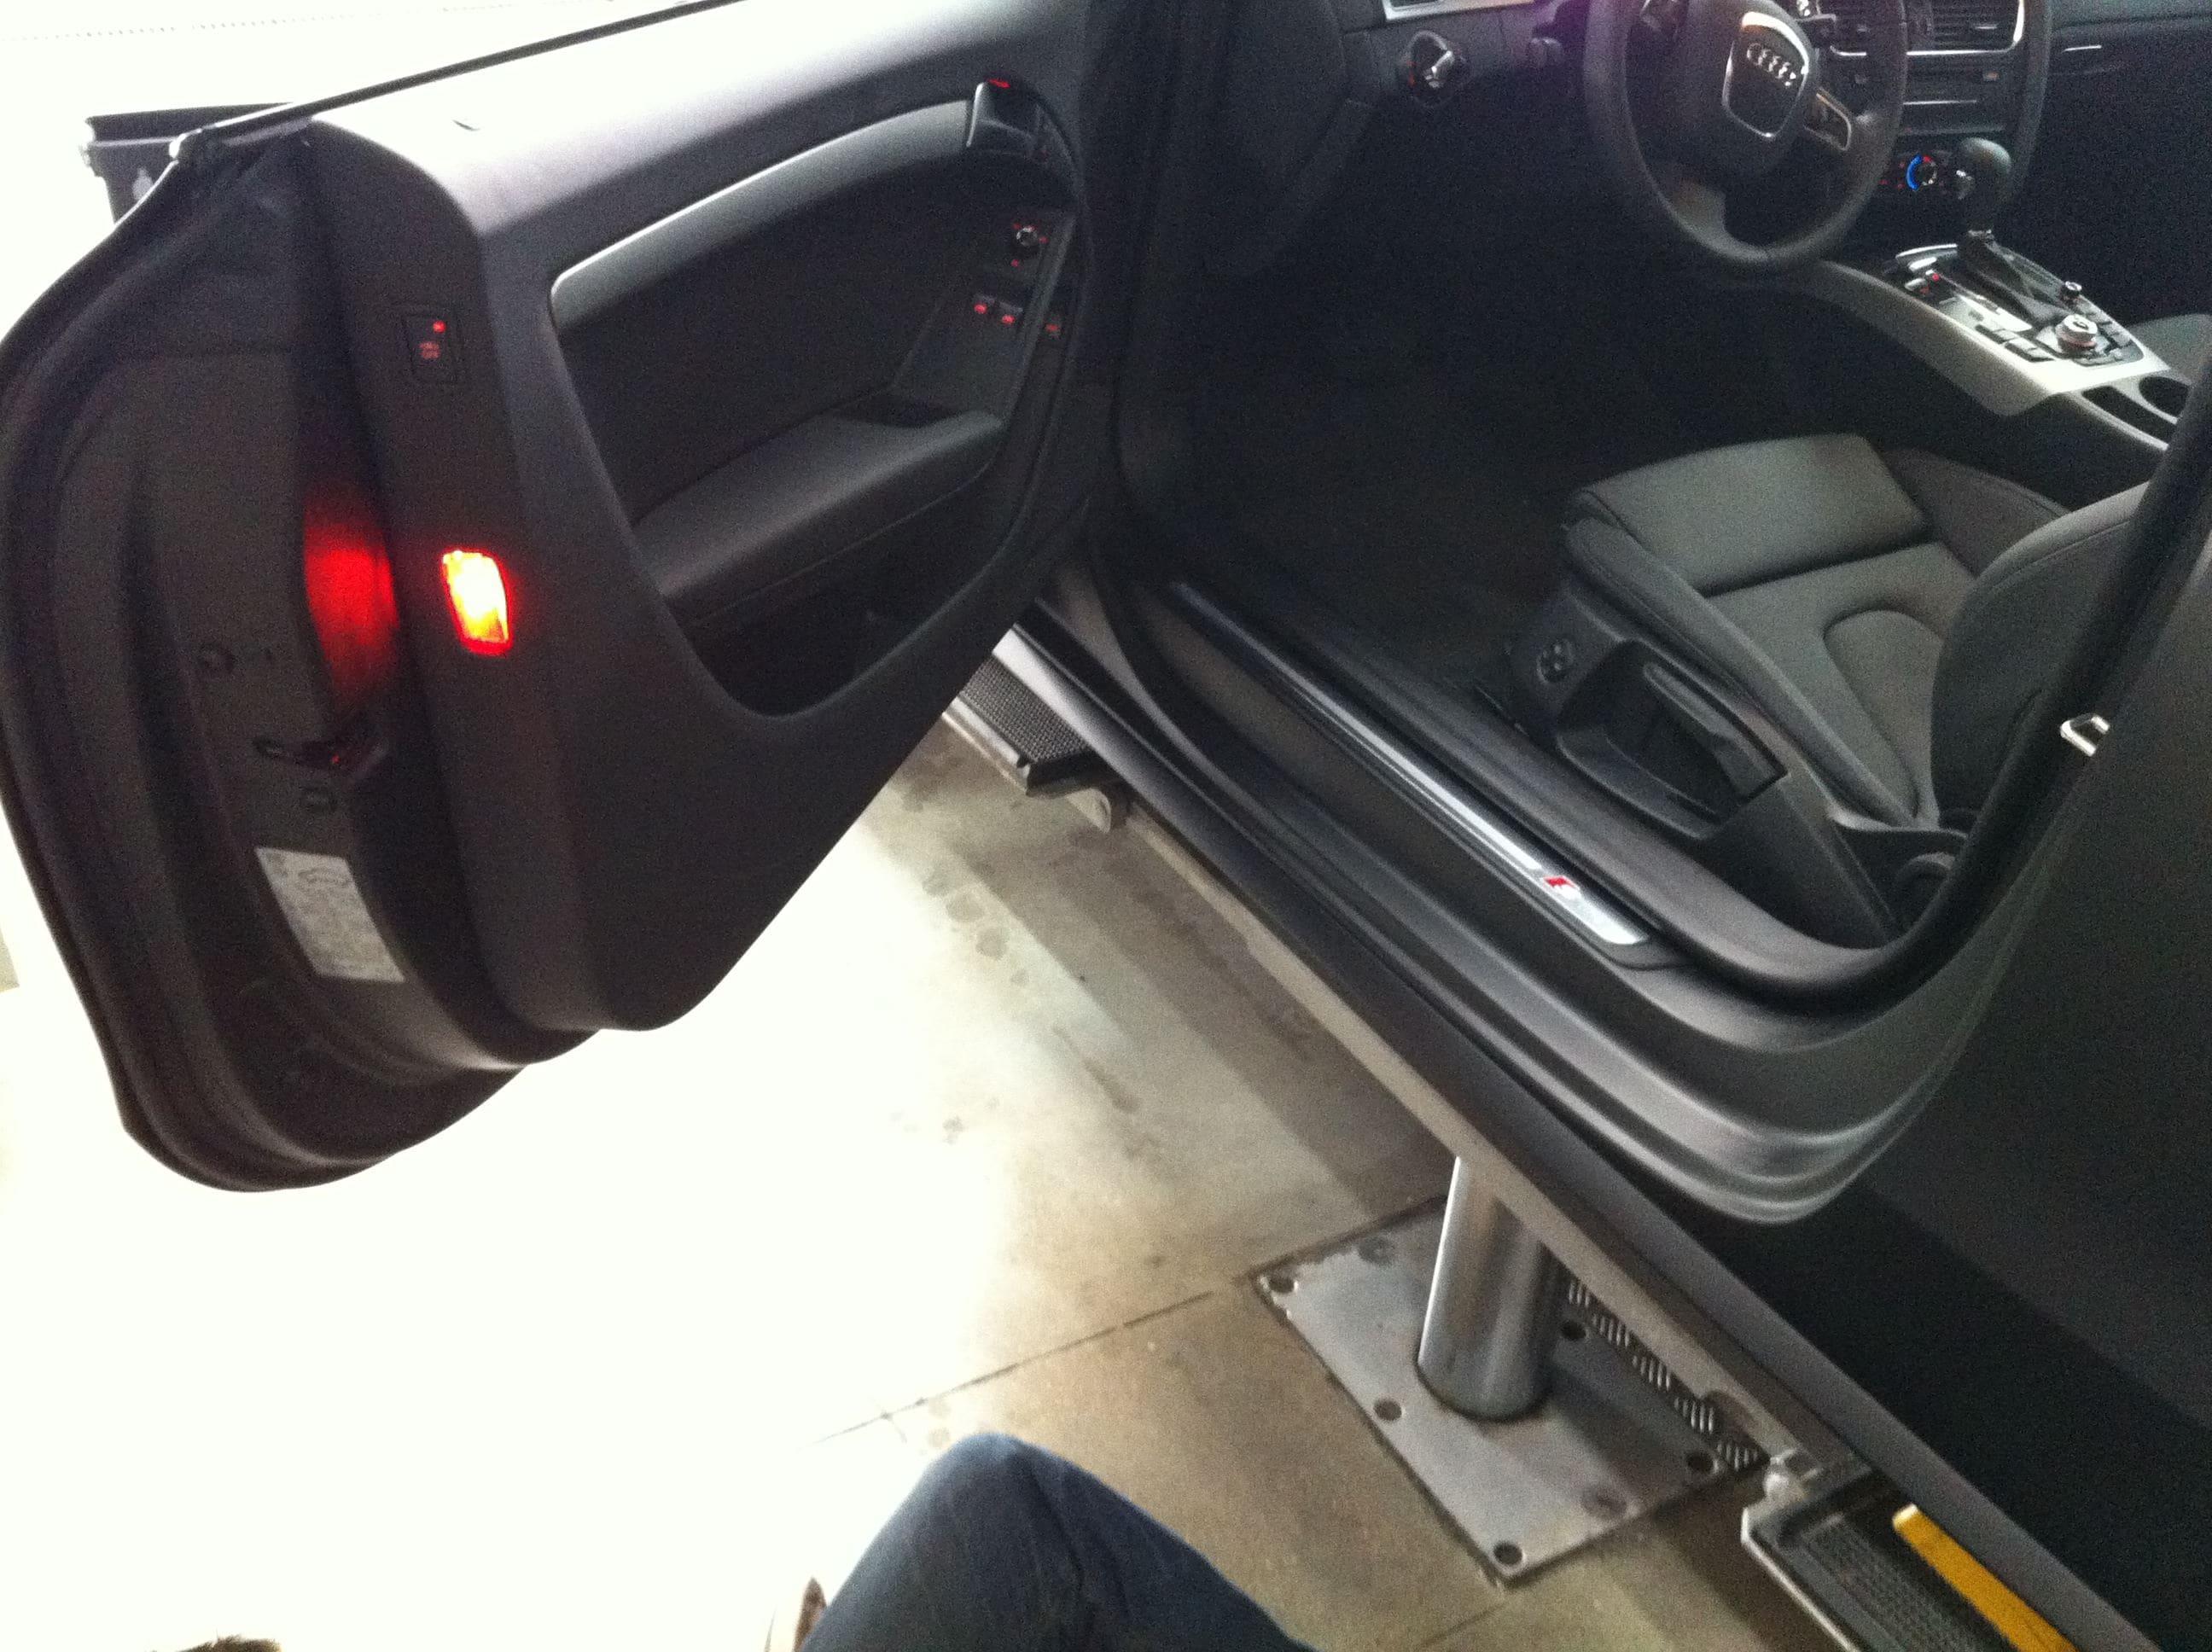 Audi A5 Coupe met Mat Zwarte Wrap, Carwrapping door Wrapmyride.nu Foto-nr:4592, ©2021